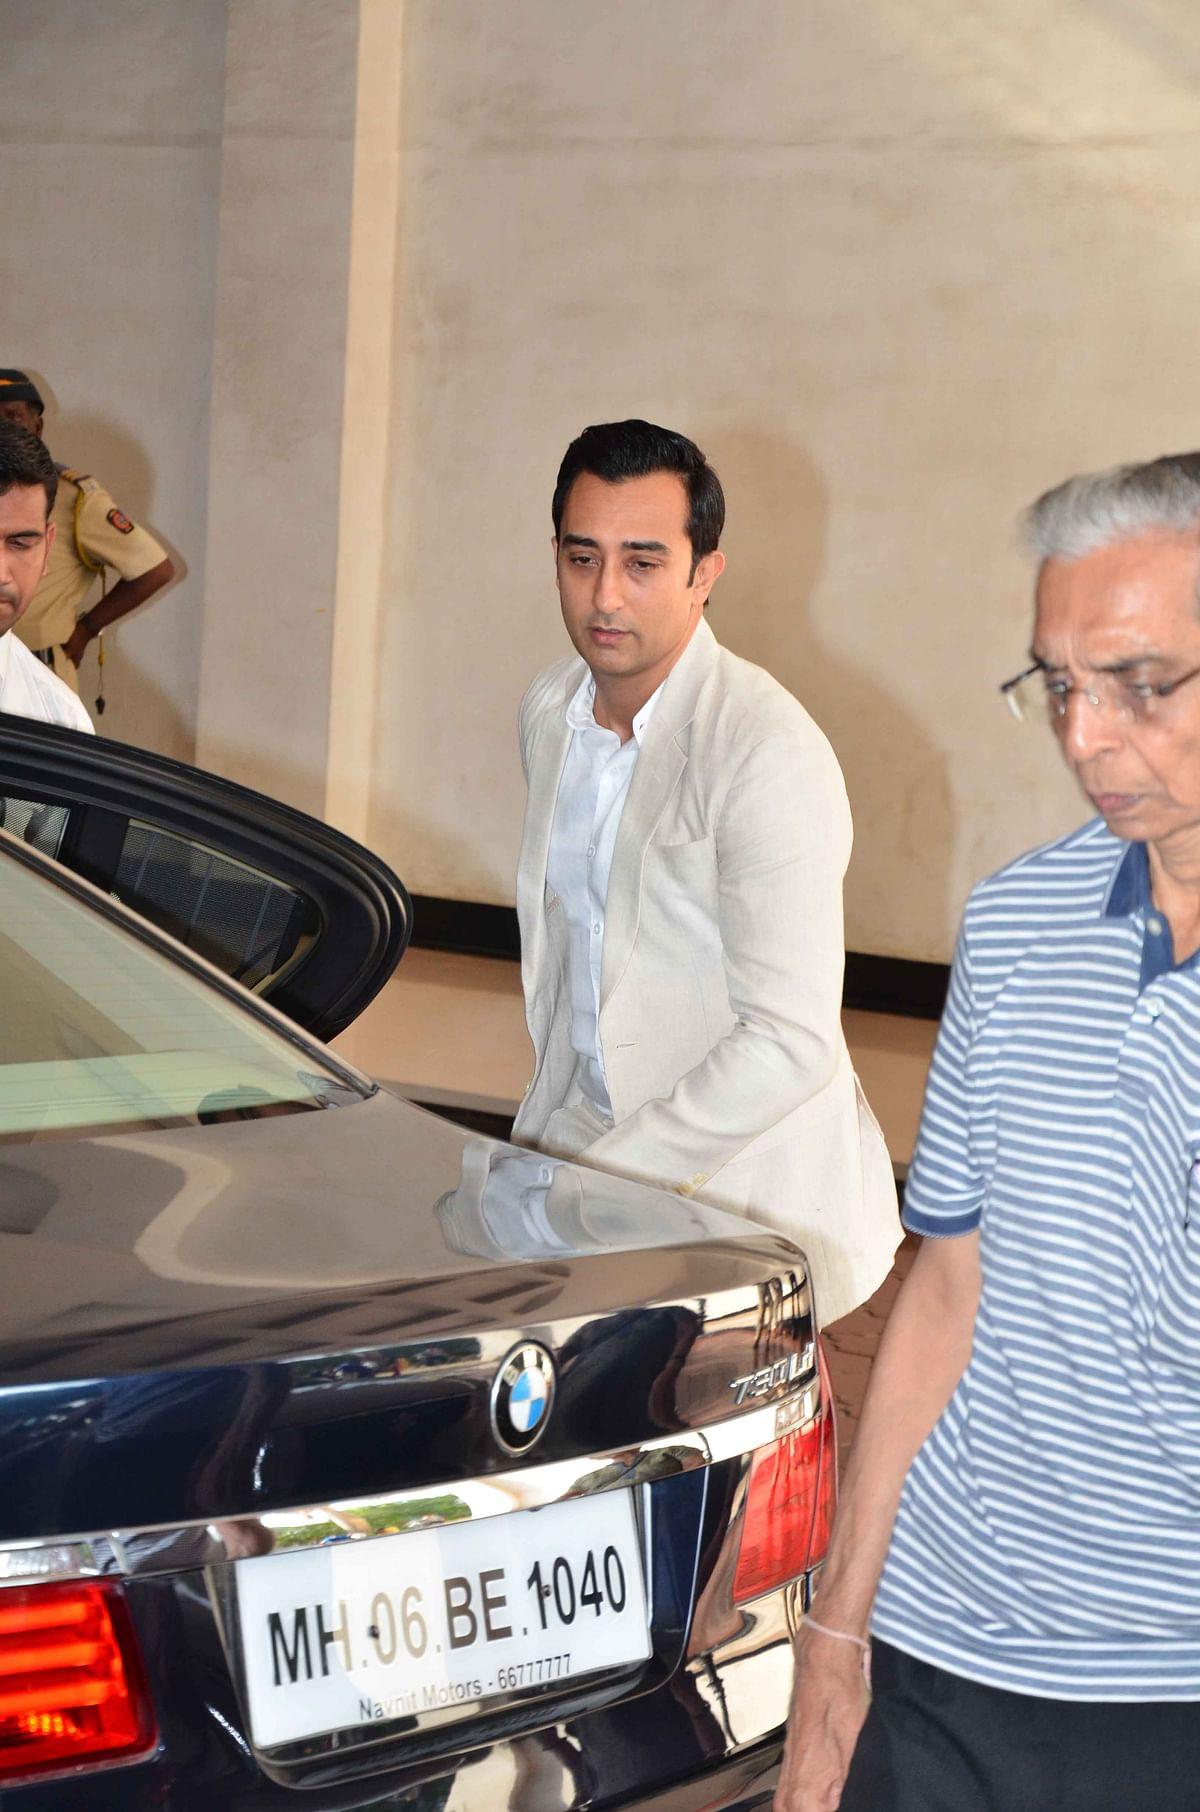 Rahul Khanna arrives for his father's prayer meet. (Photo: Yogen Shah)